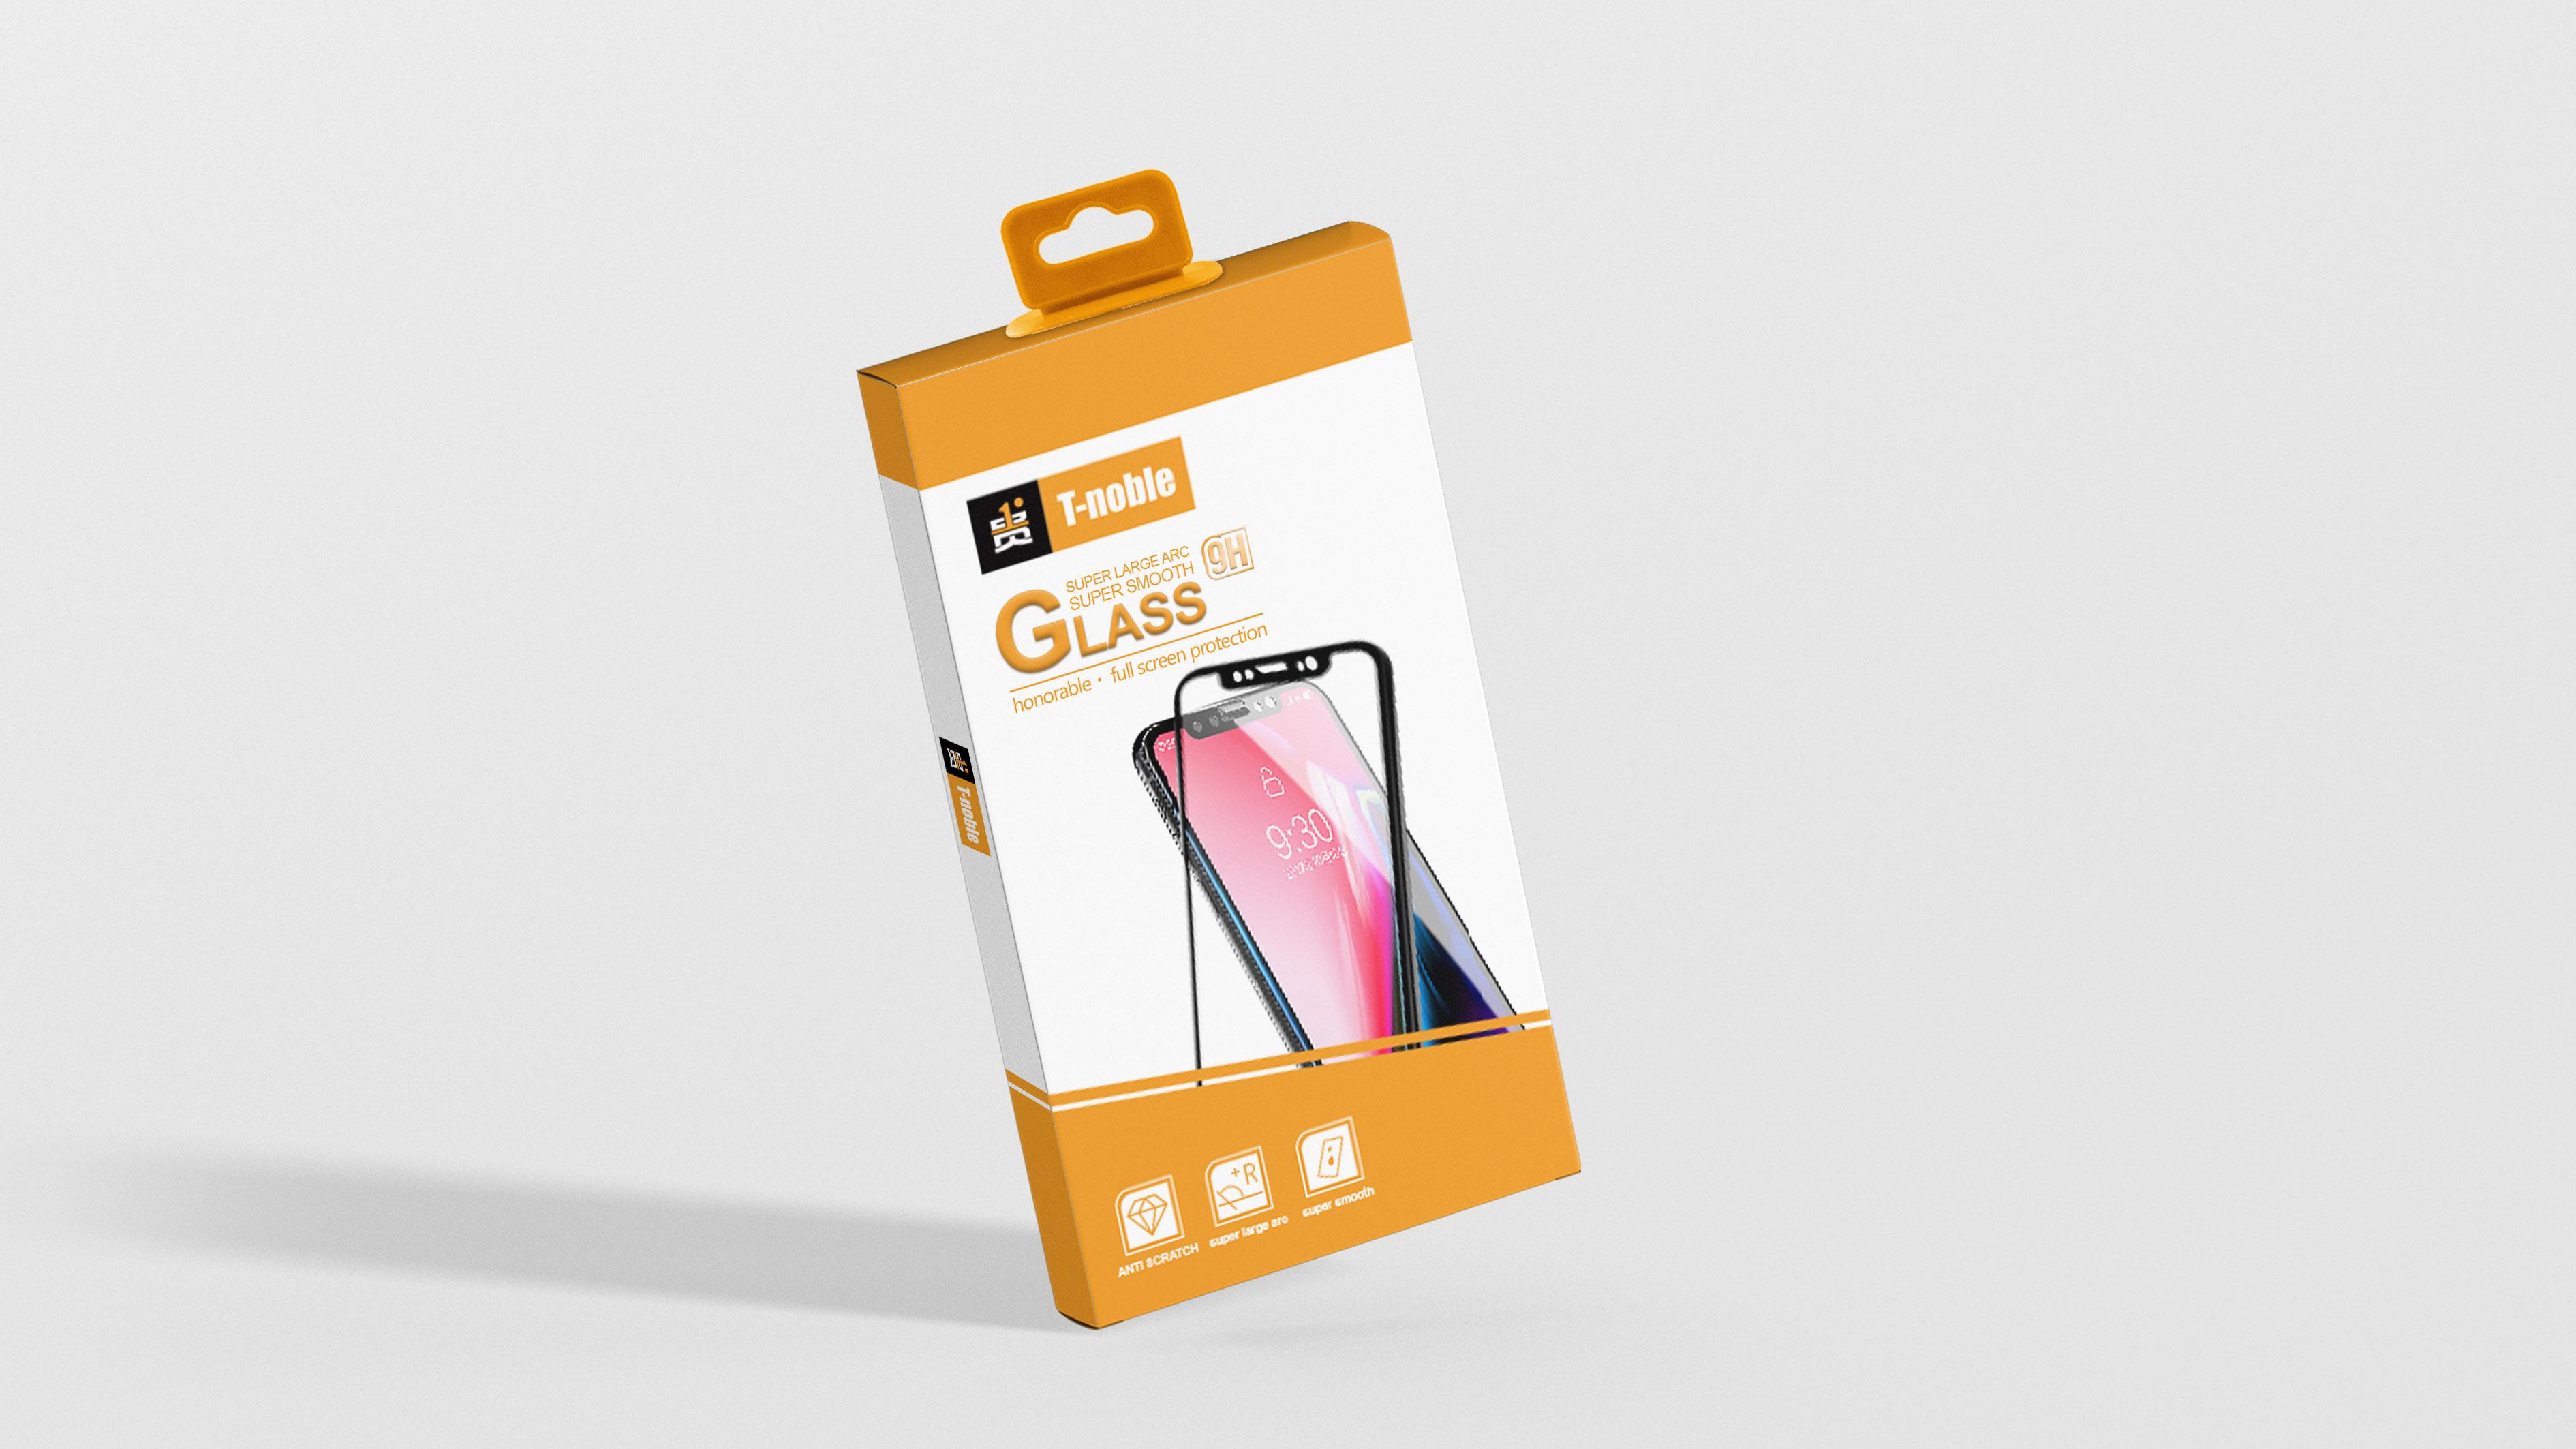 T-noble手机膜包装必赢体育官方app